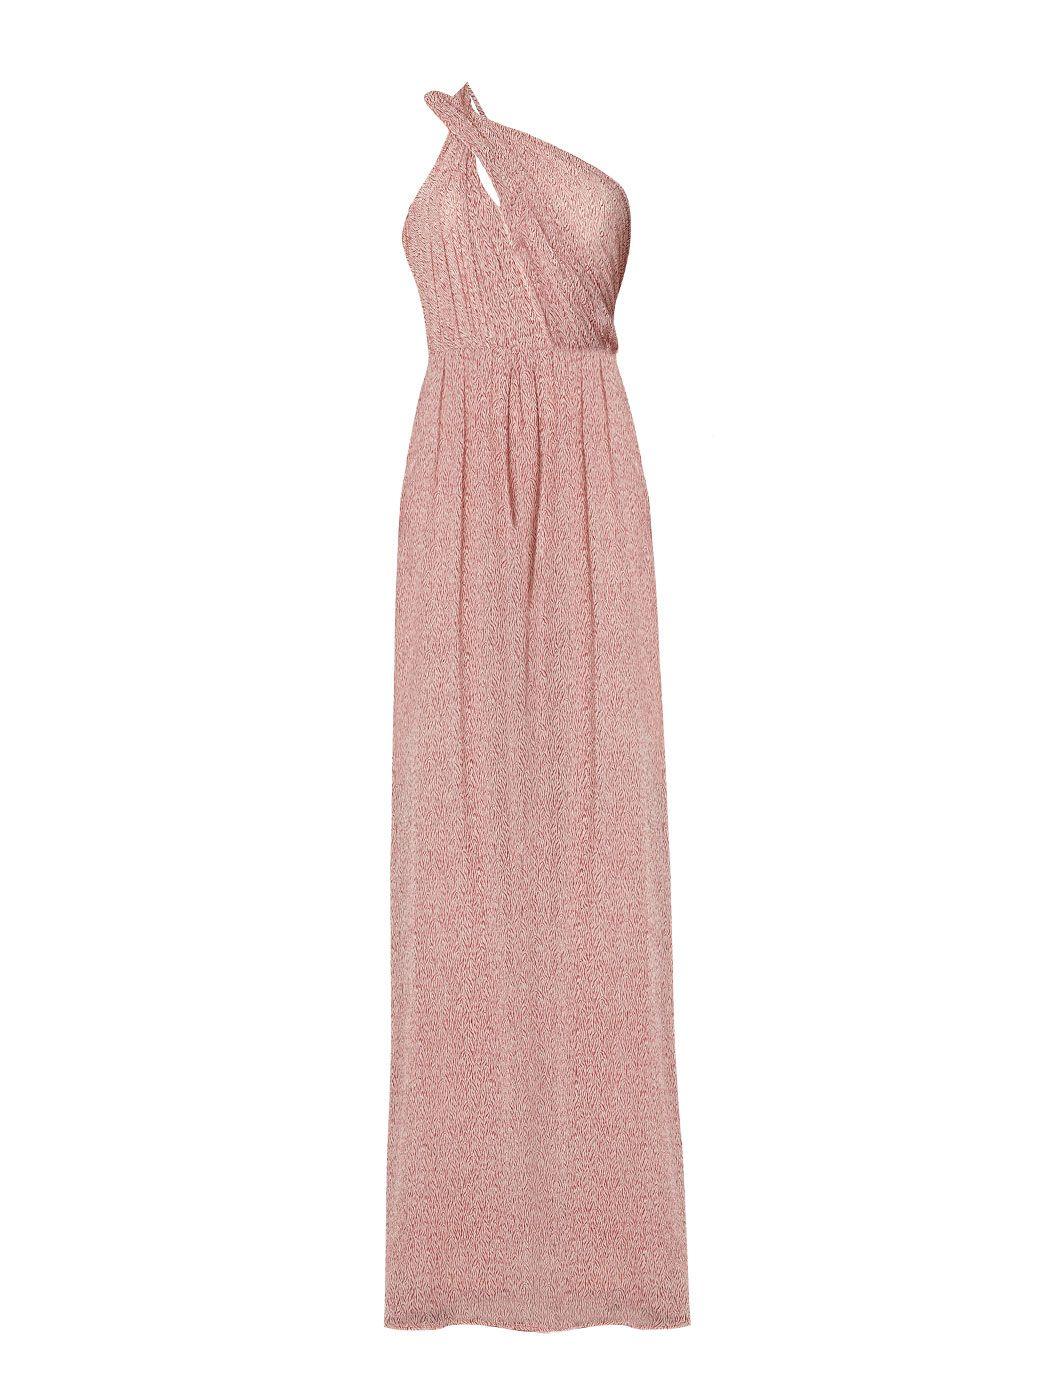 imagen producto | Vestidos/Dresses | Pinterest | Vestidos fluidos ...